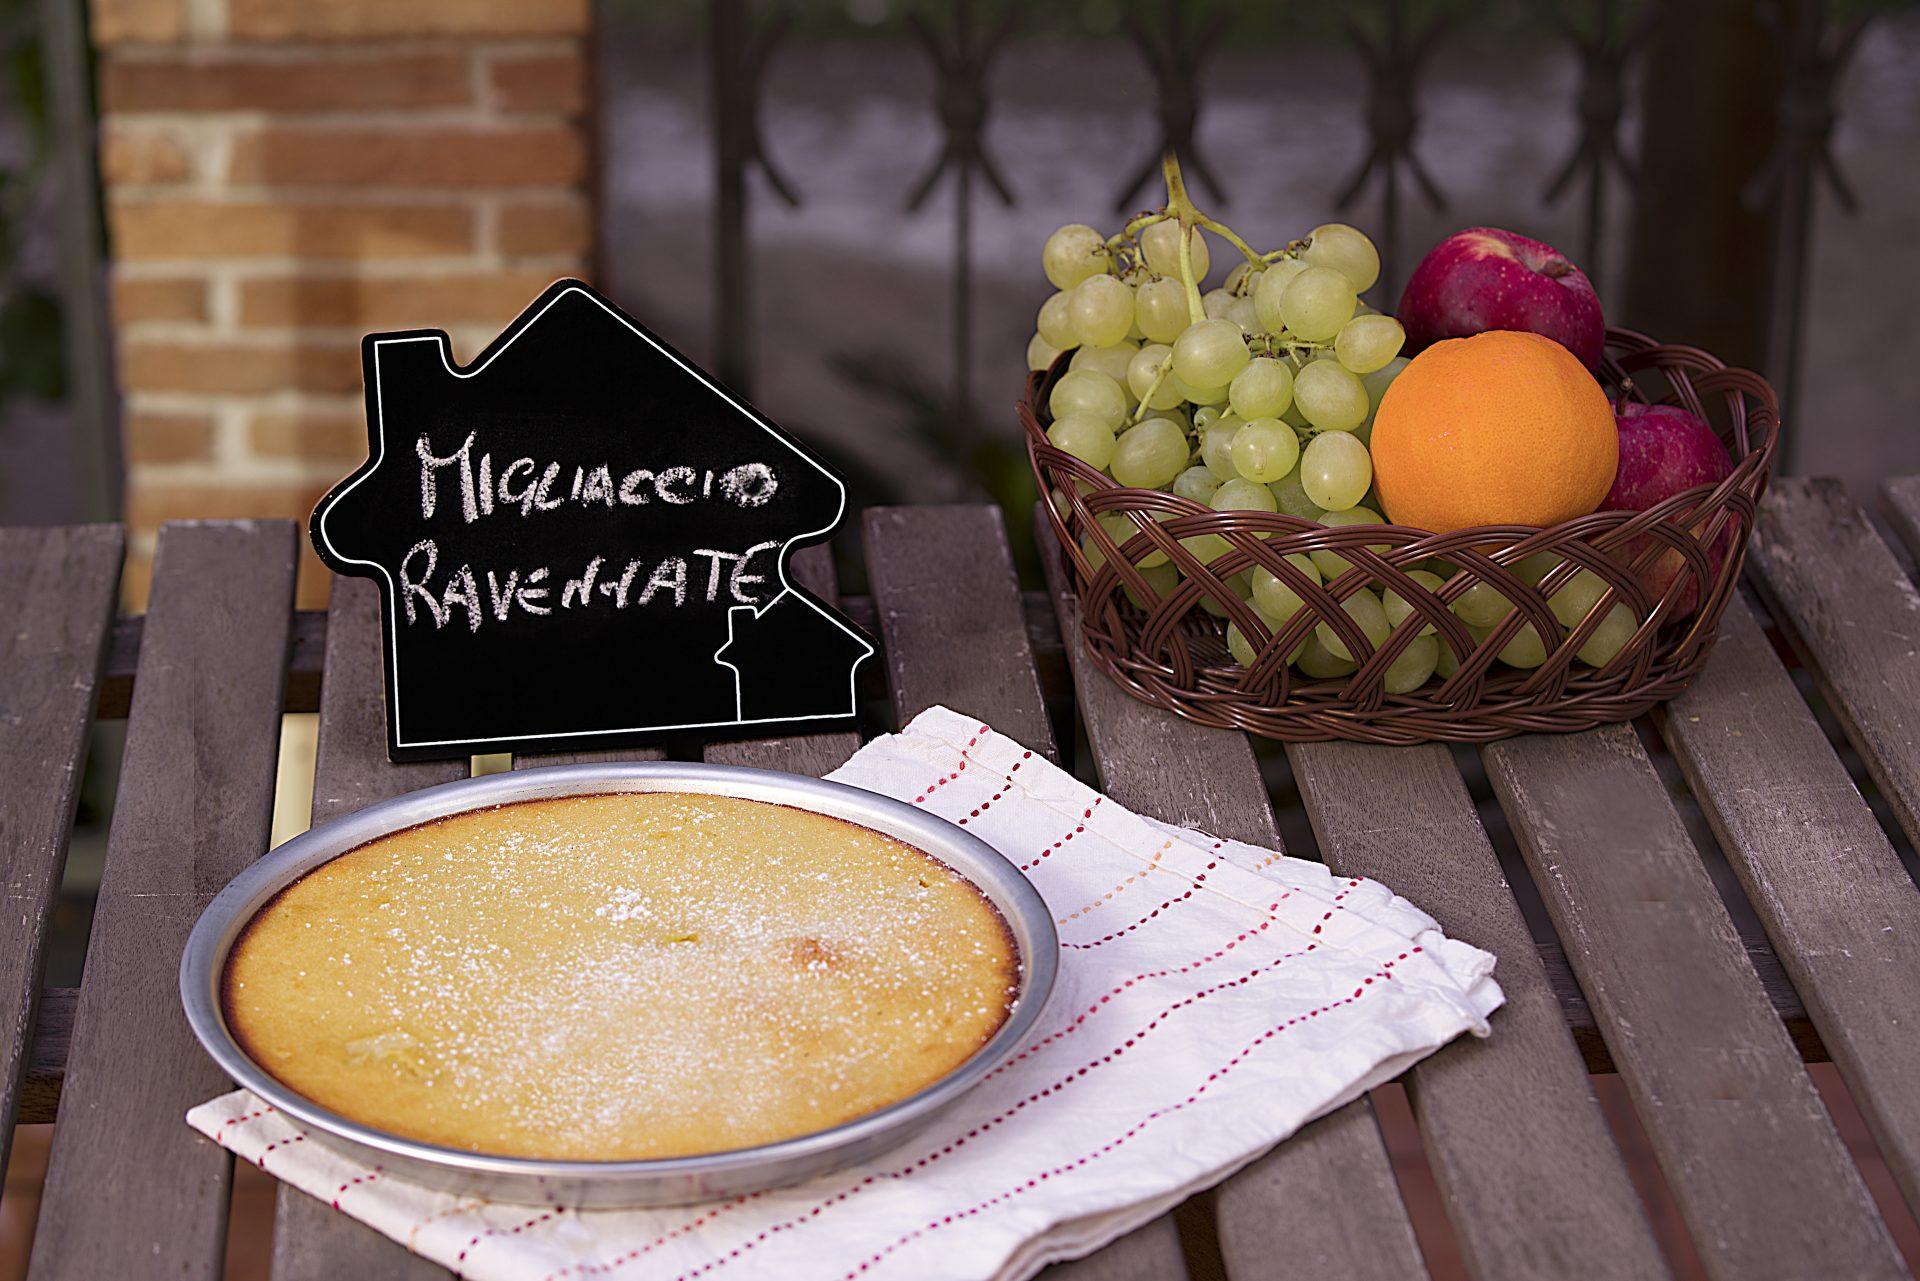 Migliaccio_Ravennate_ricetta